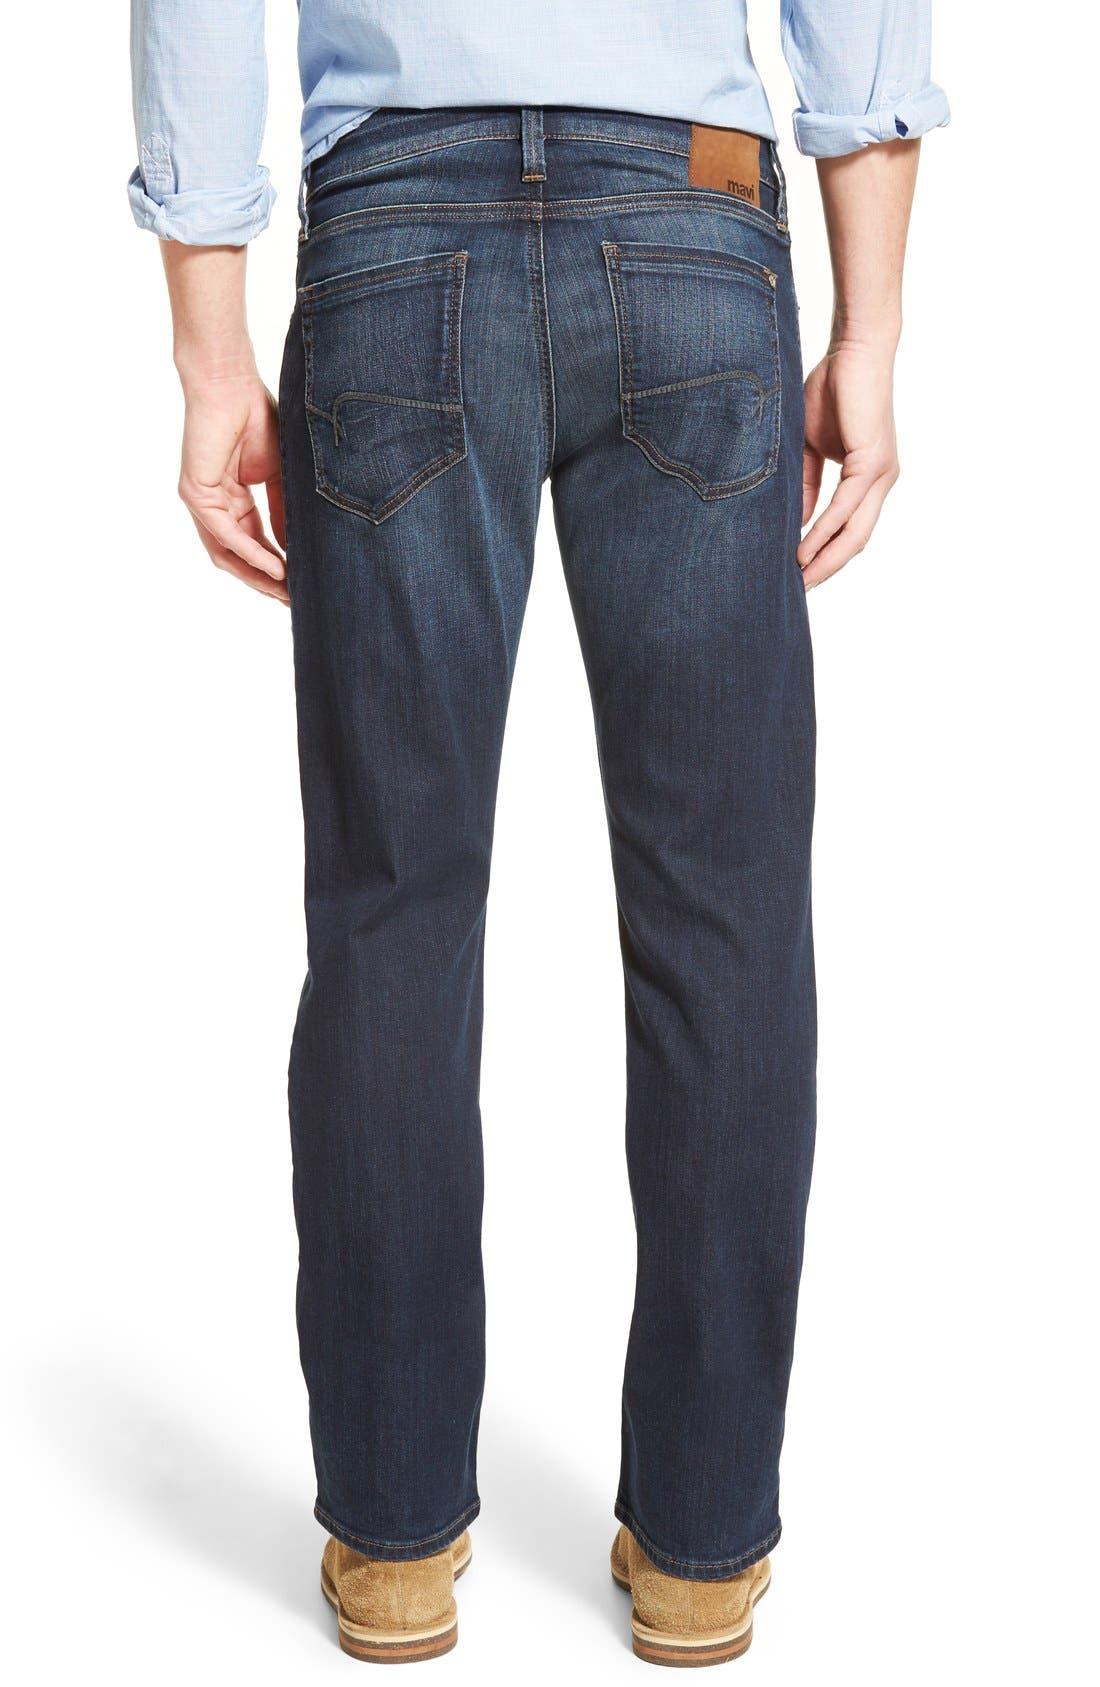 MAVI JEANS,                             Zach Straight Leg Jeans,                             Alternate thumbnail 5, color,                             DARK BRUSHED WILLIAMSBURG